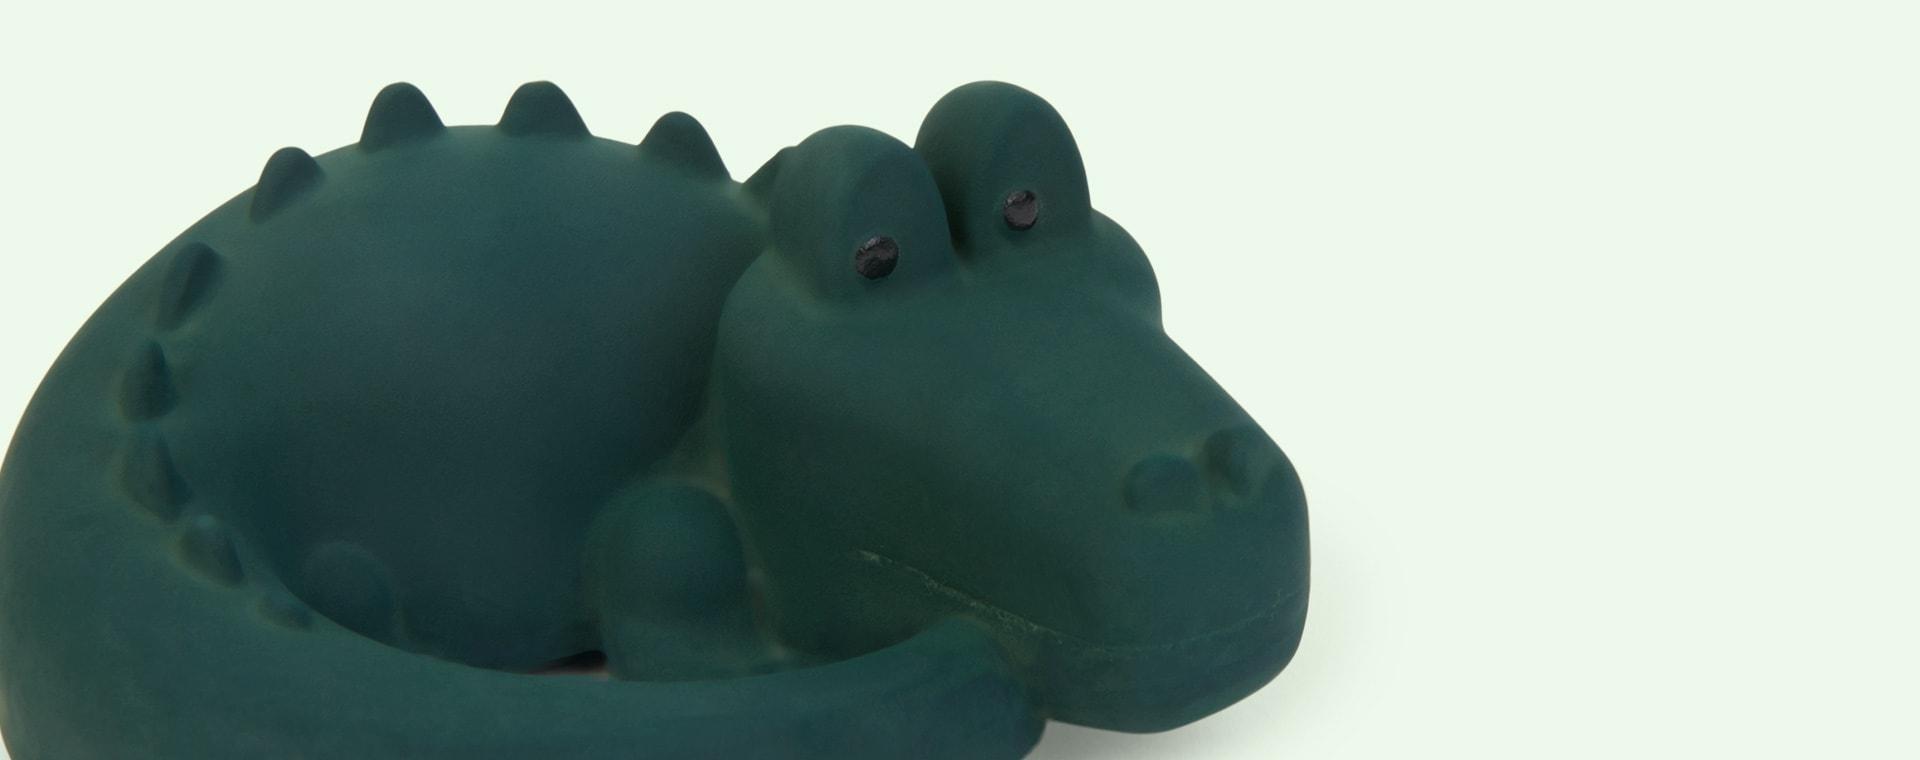 Safari green mix Liewood Vikky Bath Toy - 2 Pack